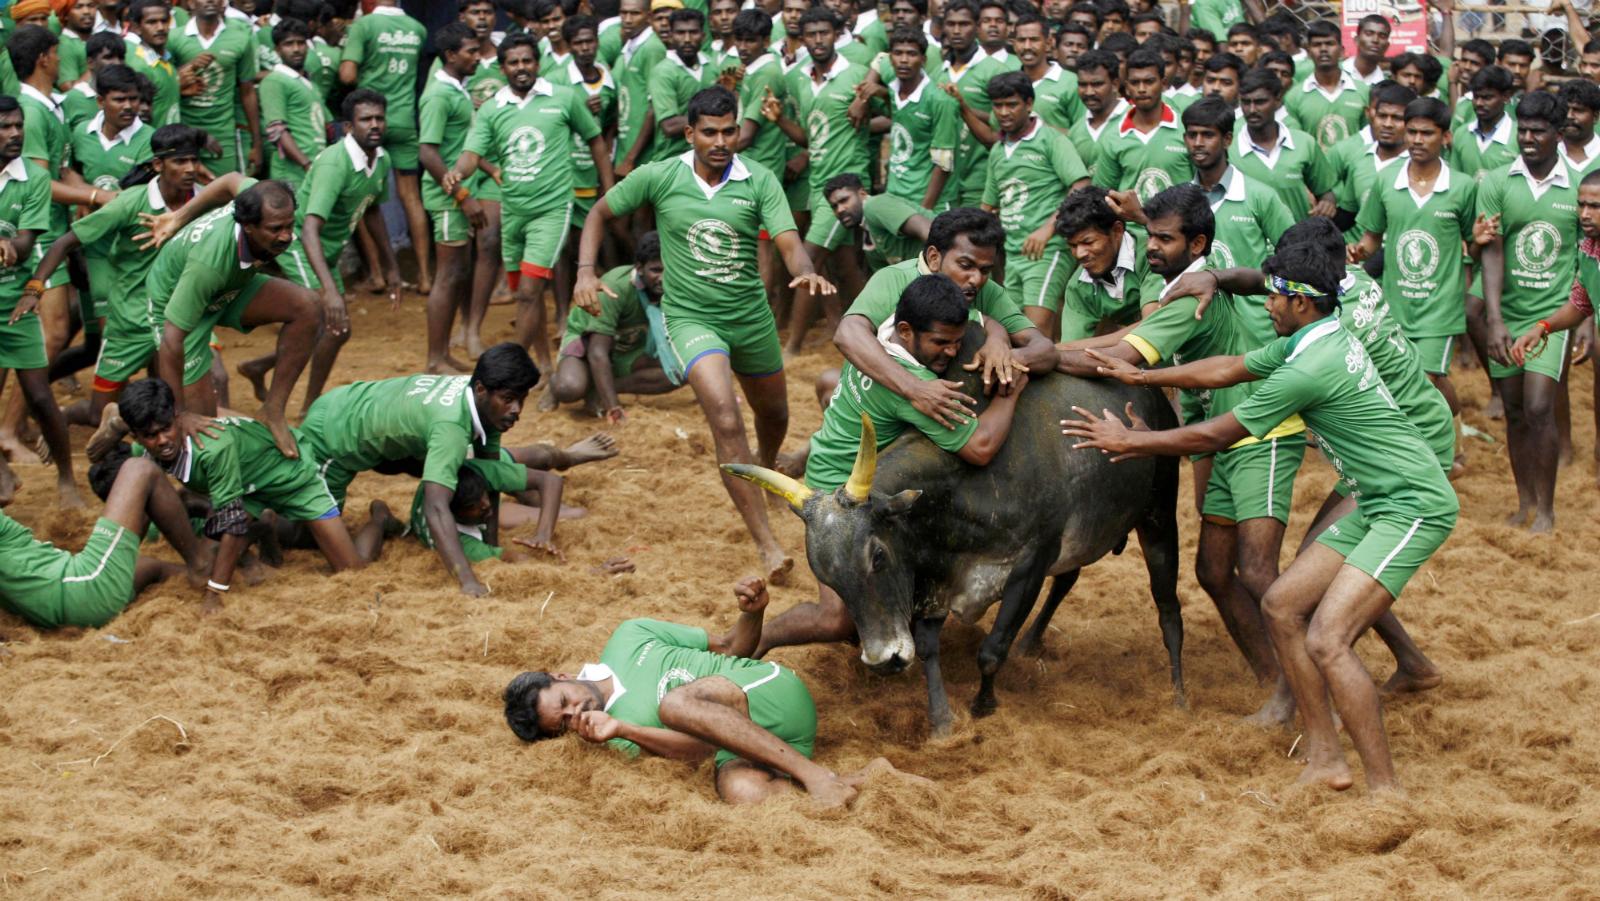 India-Tamil Nadu-Chennai-Jallikkattu-Narendra Modi